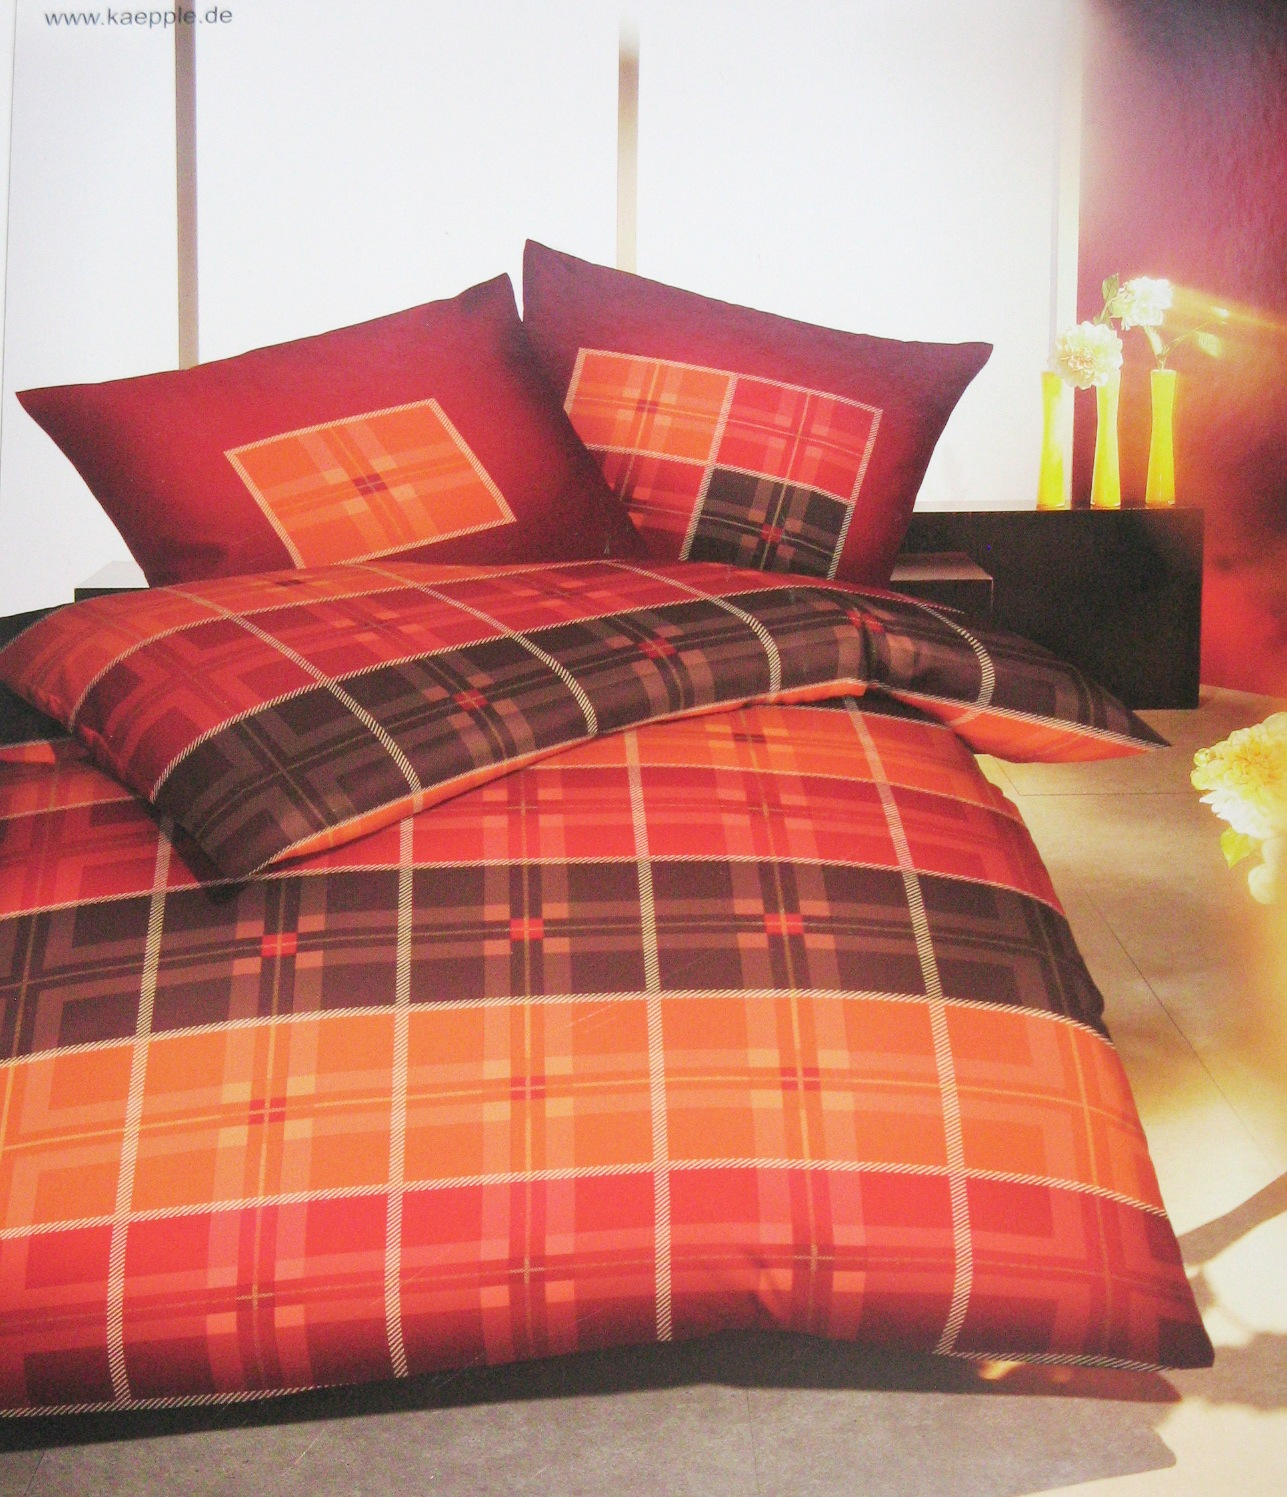 kaeppel microfaser flanell bettw sche karo look terra 2 tlg 155x220 neu. Black Bedroom Furniture Sets. Home Design Ideas